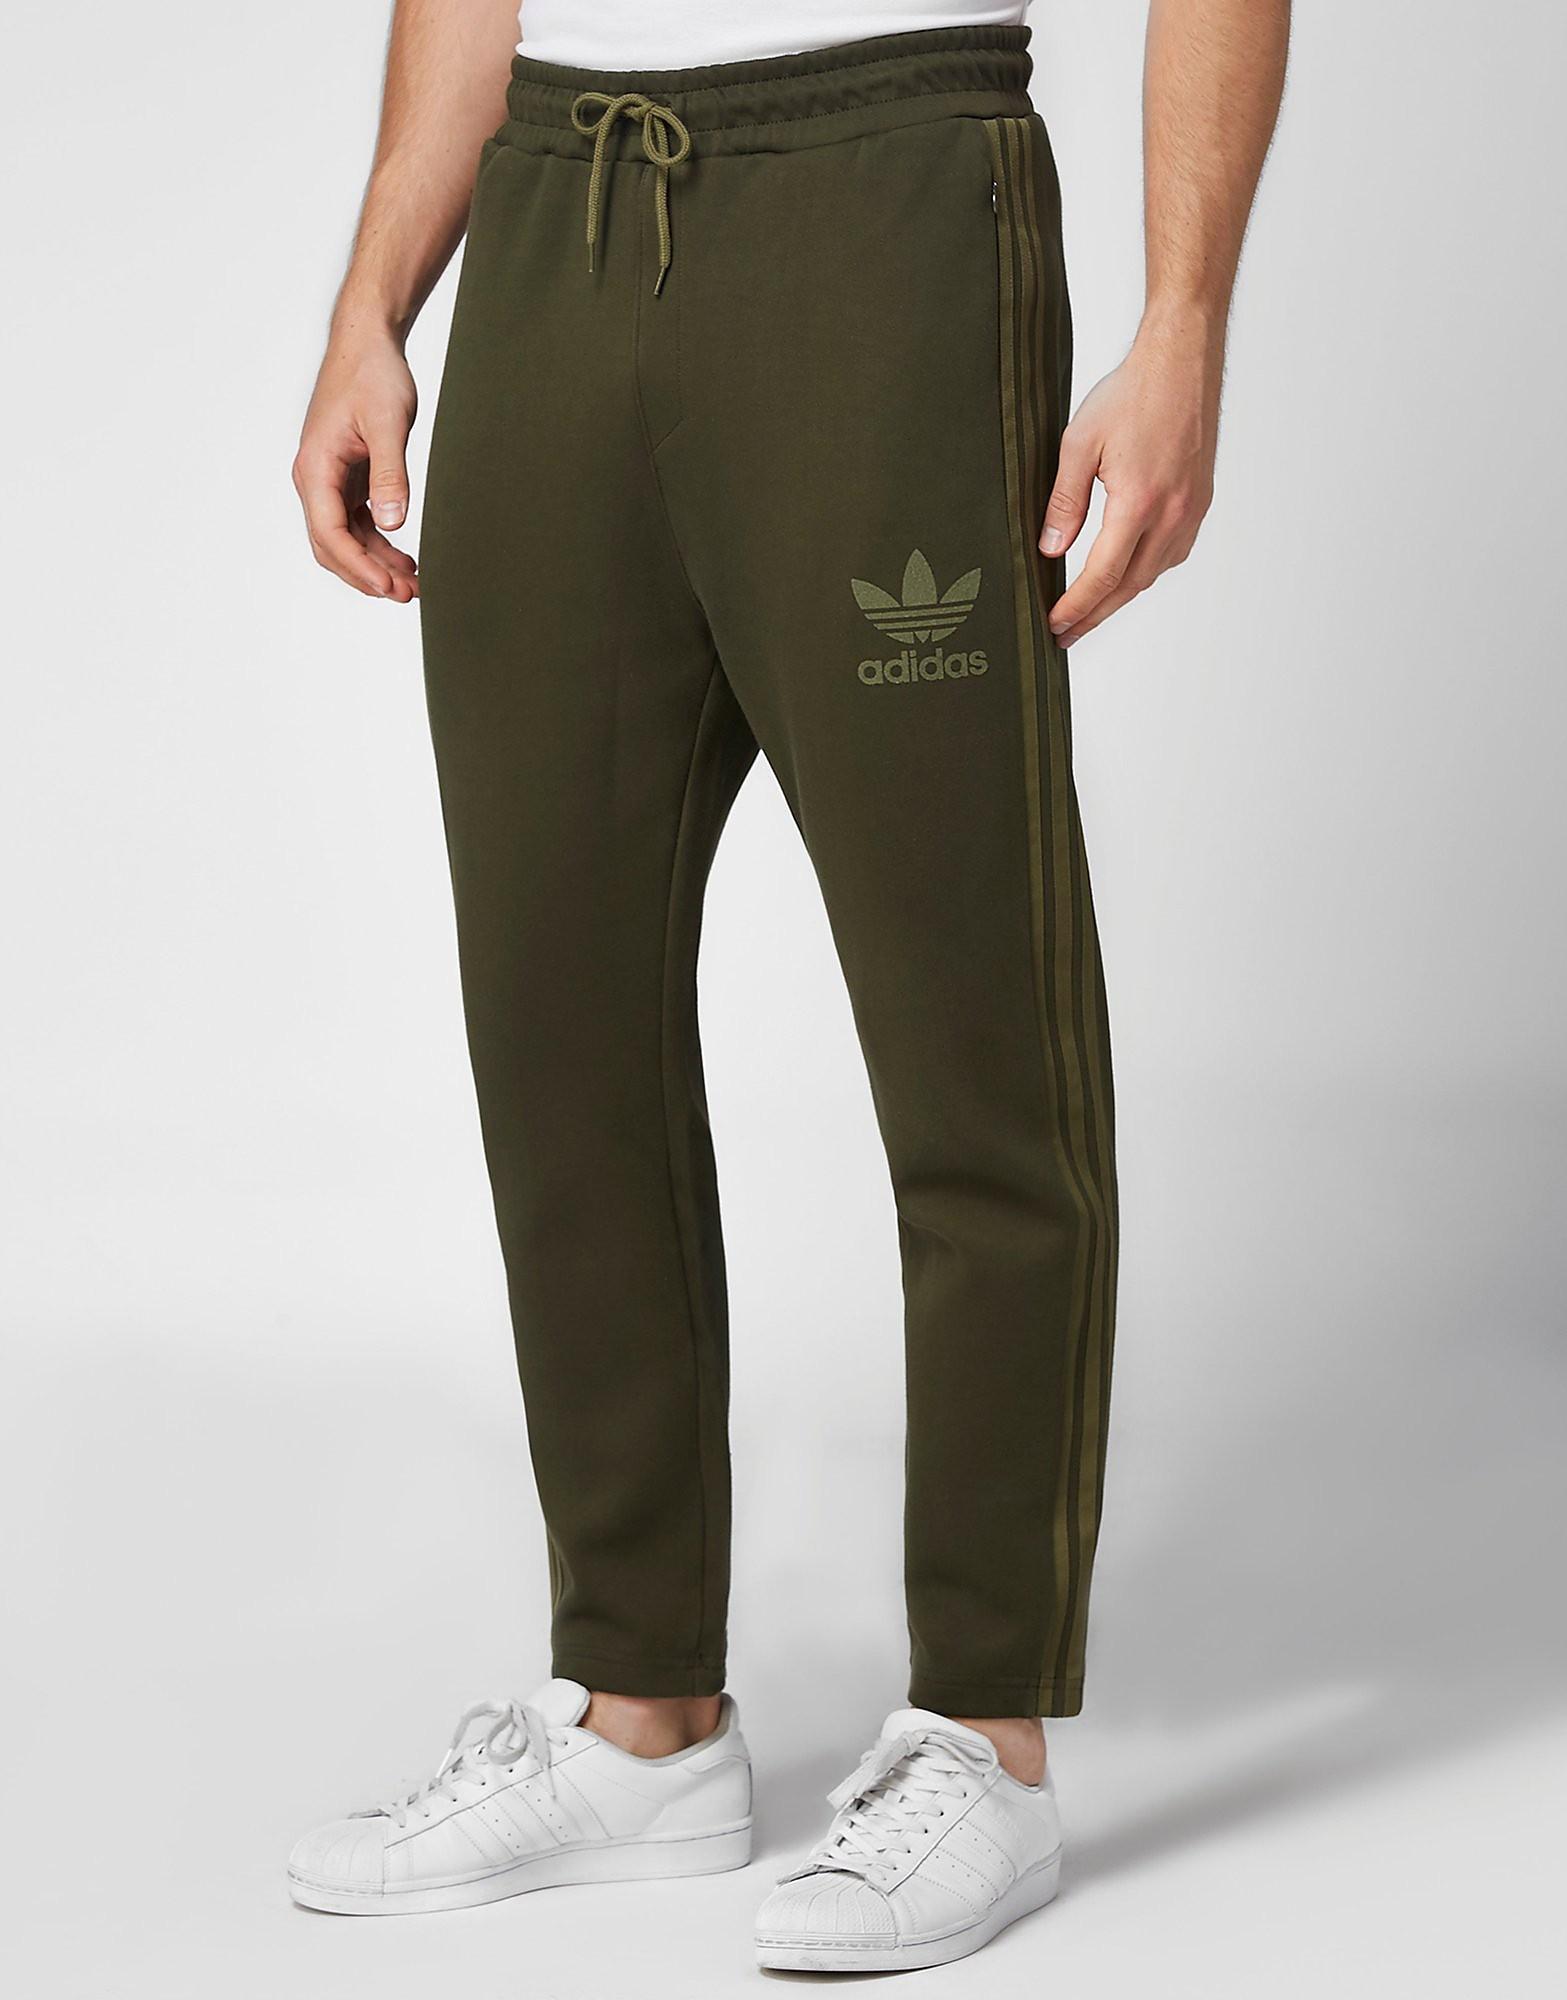 adidas Originals adicolor Skinny Track Pants  Green Green